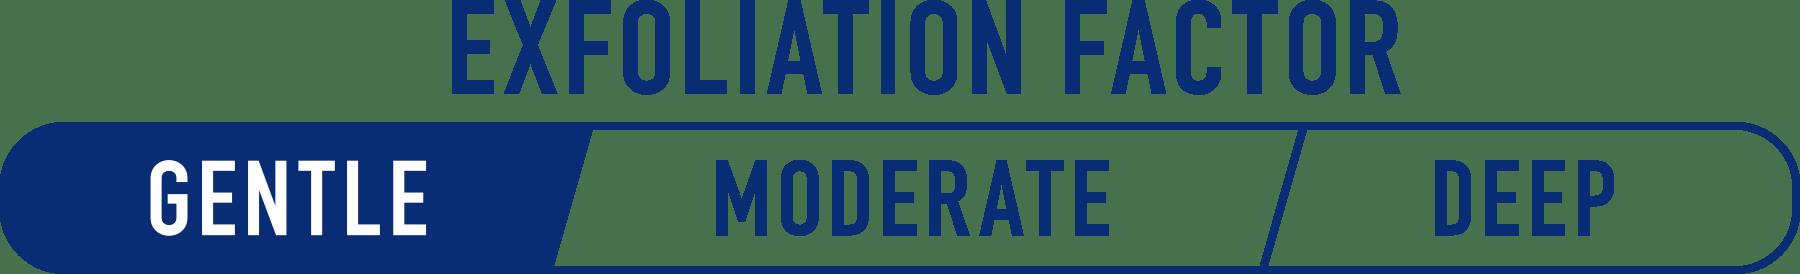 Exfoliation Factor Gentle